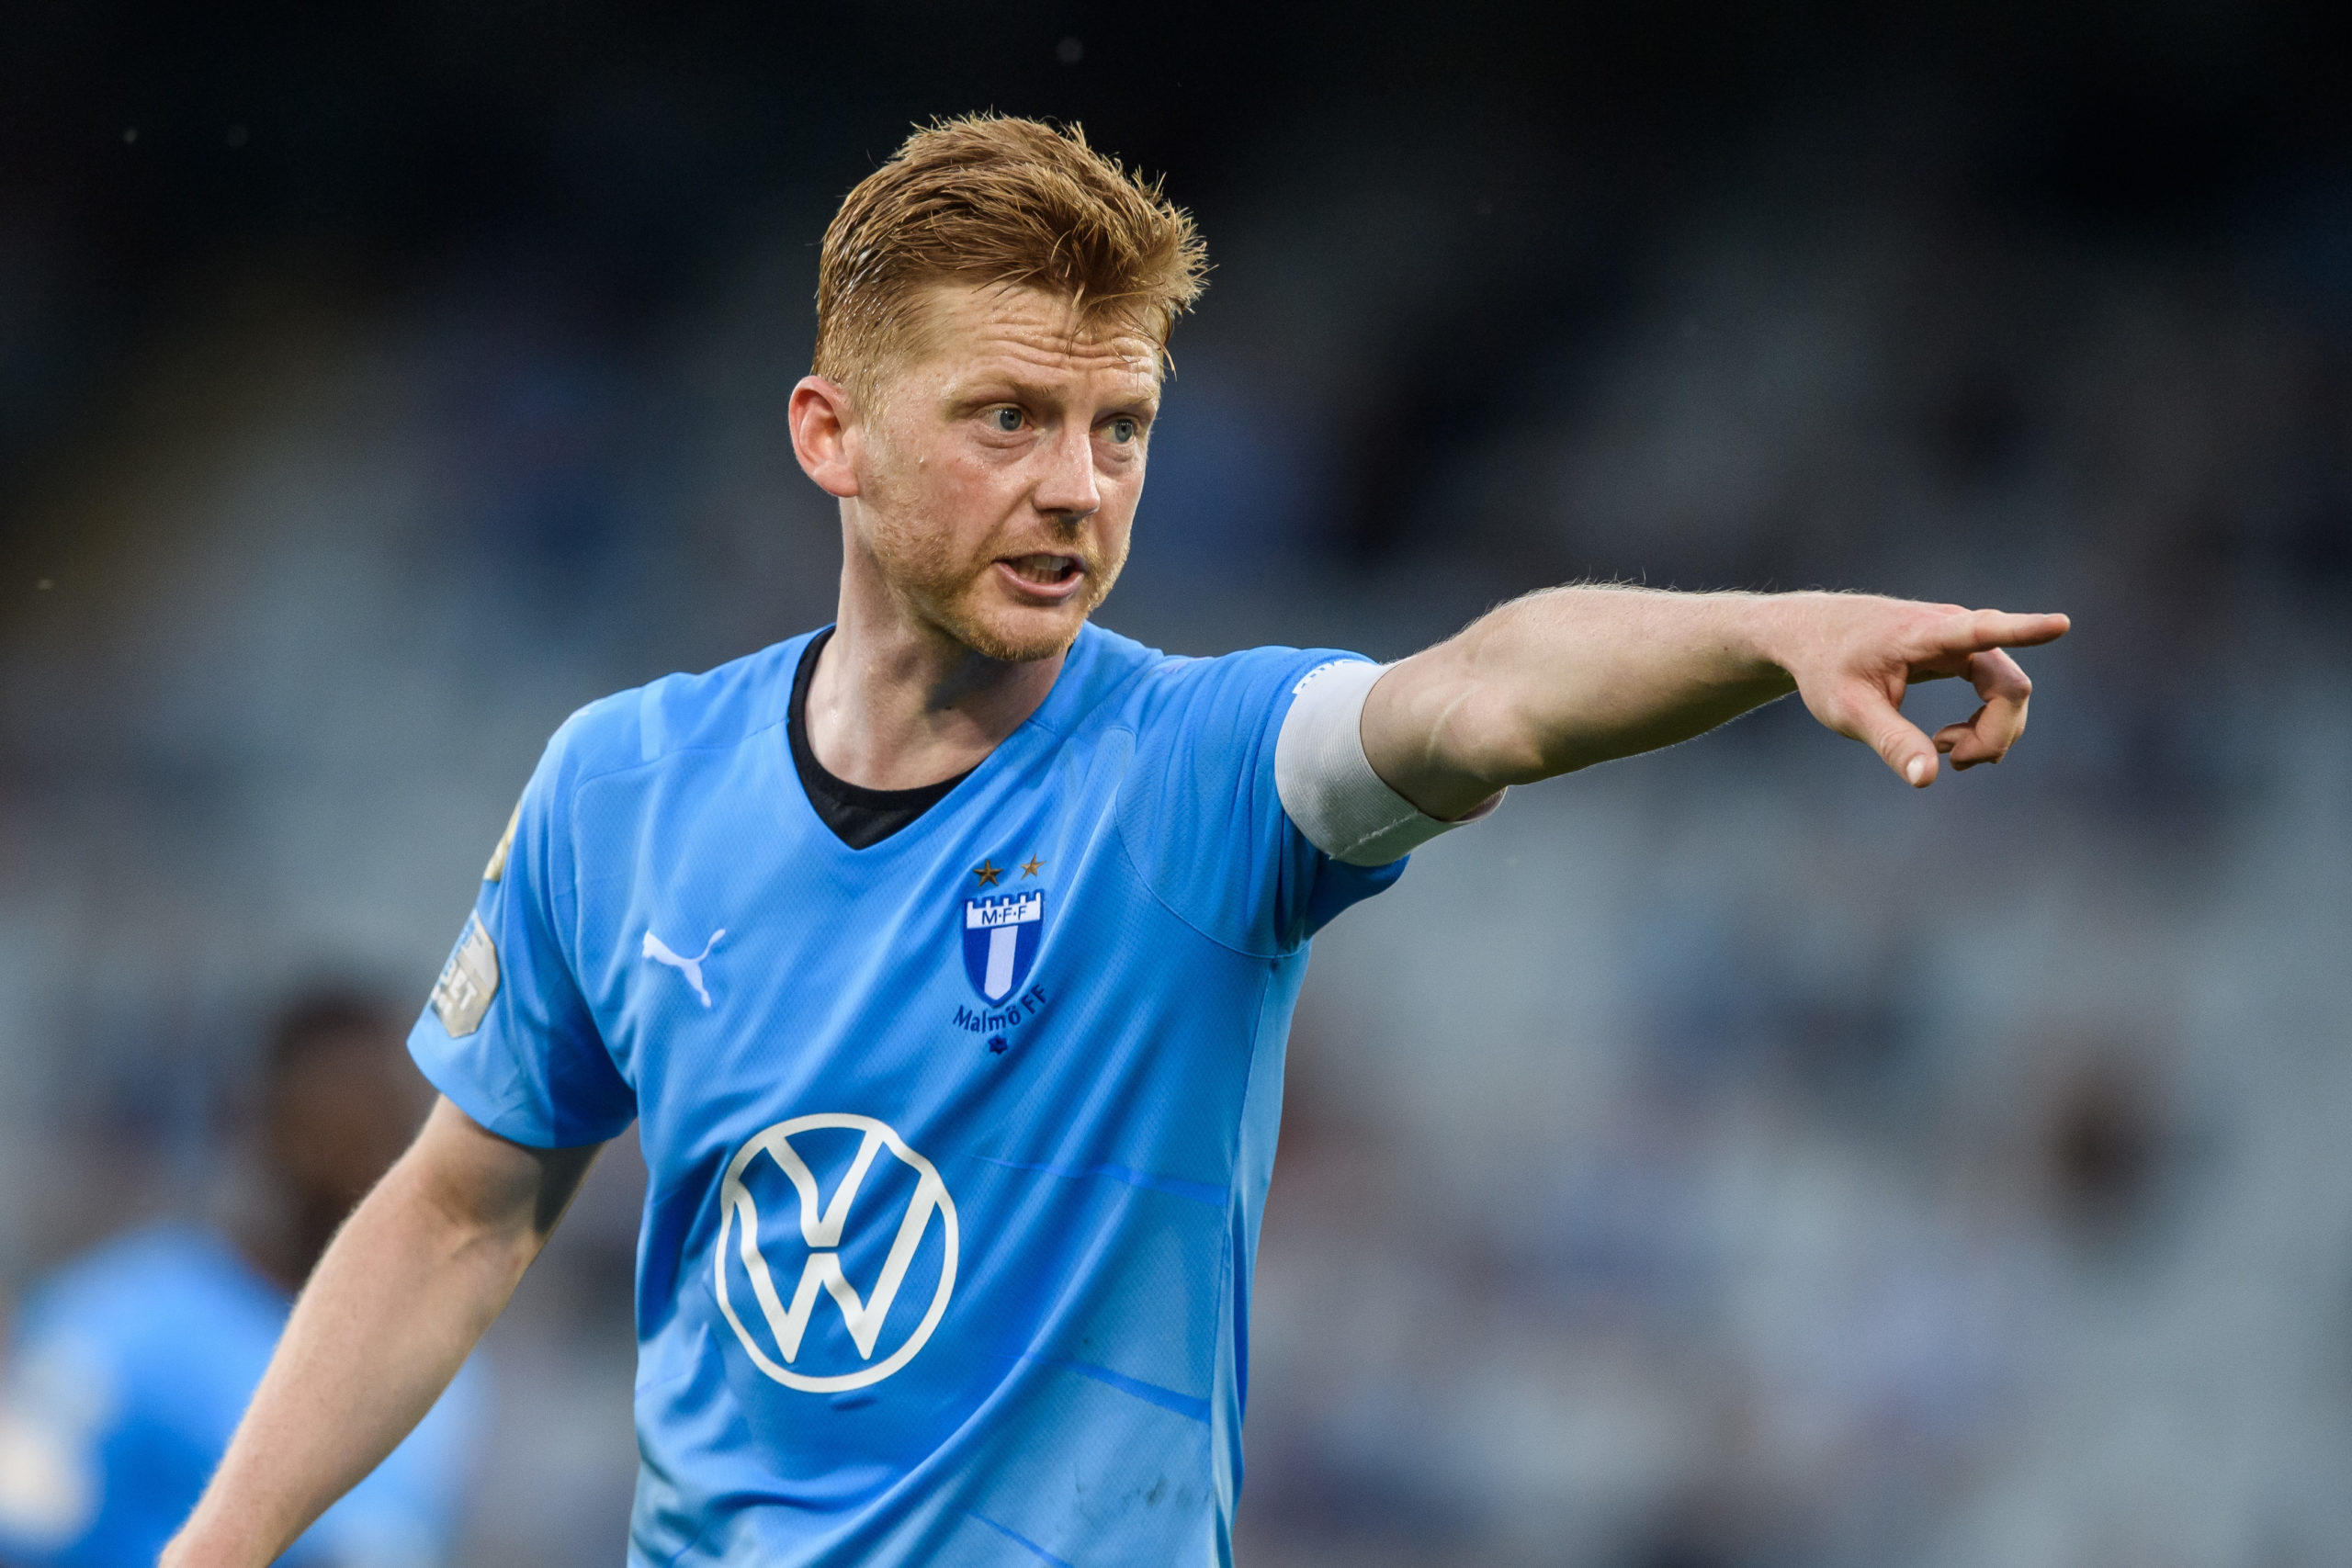 Sportbladet Play sänder tisdagens kvalmatch